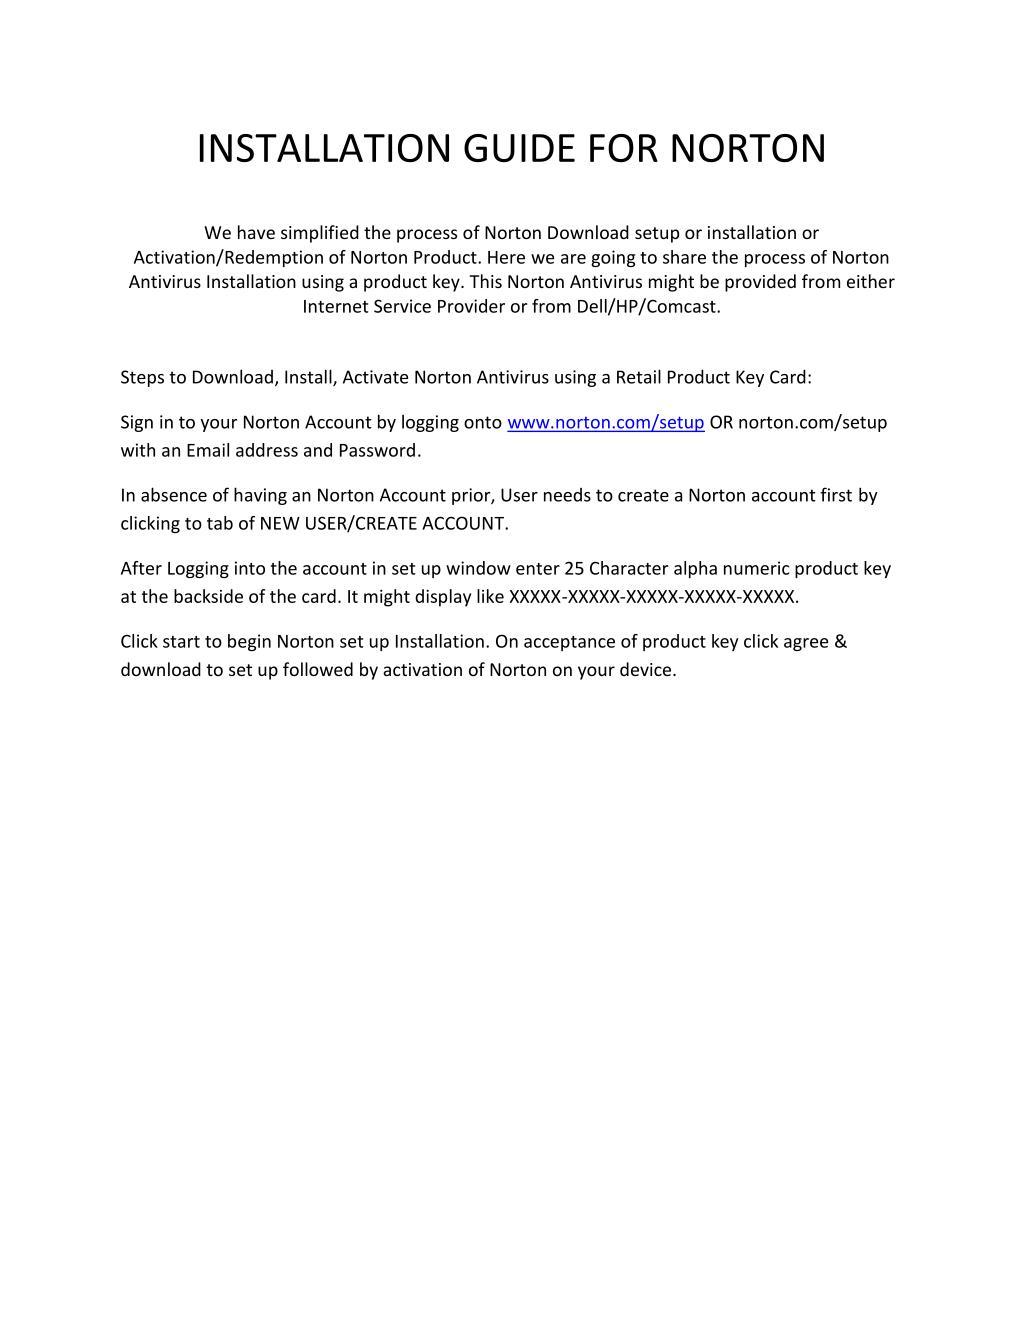 PPT - Norton com/setup - Download, Activate, Install